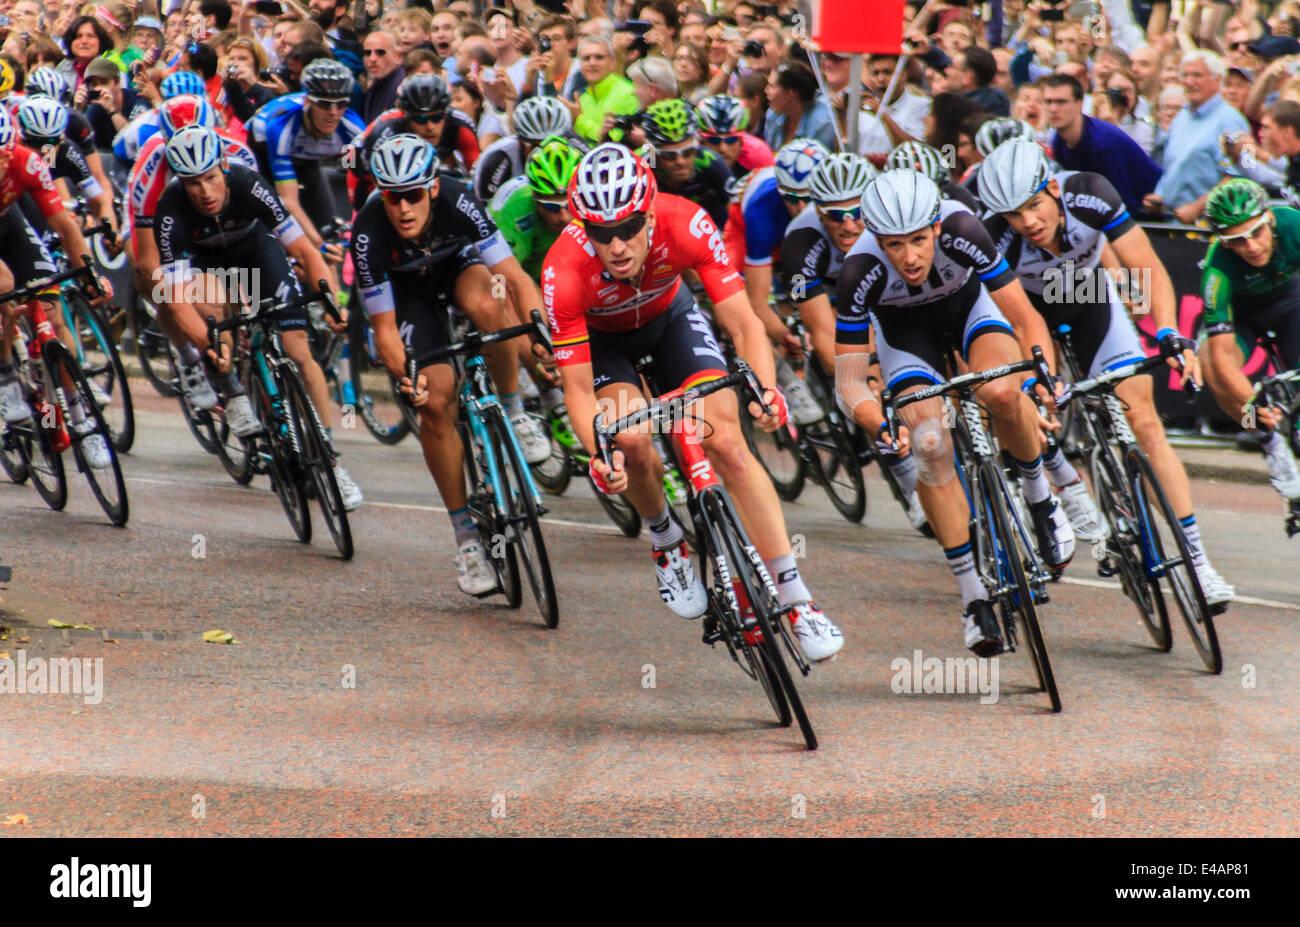 f8f54ff26 Tour de France 2014. Lars Bak of team Lotto-Belisol leads the third stage